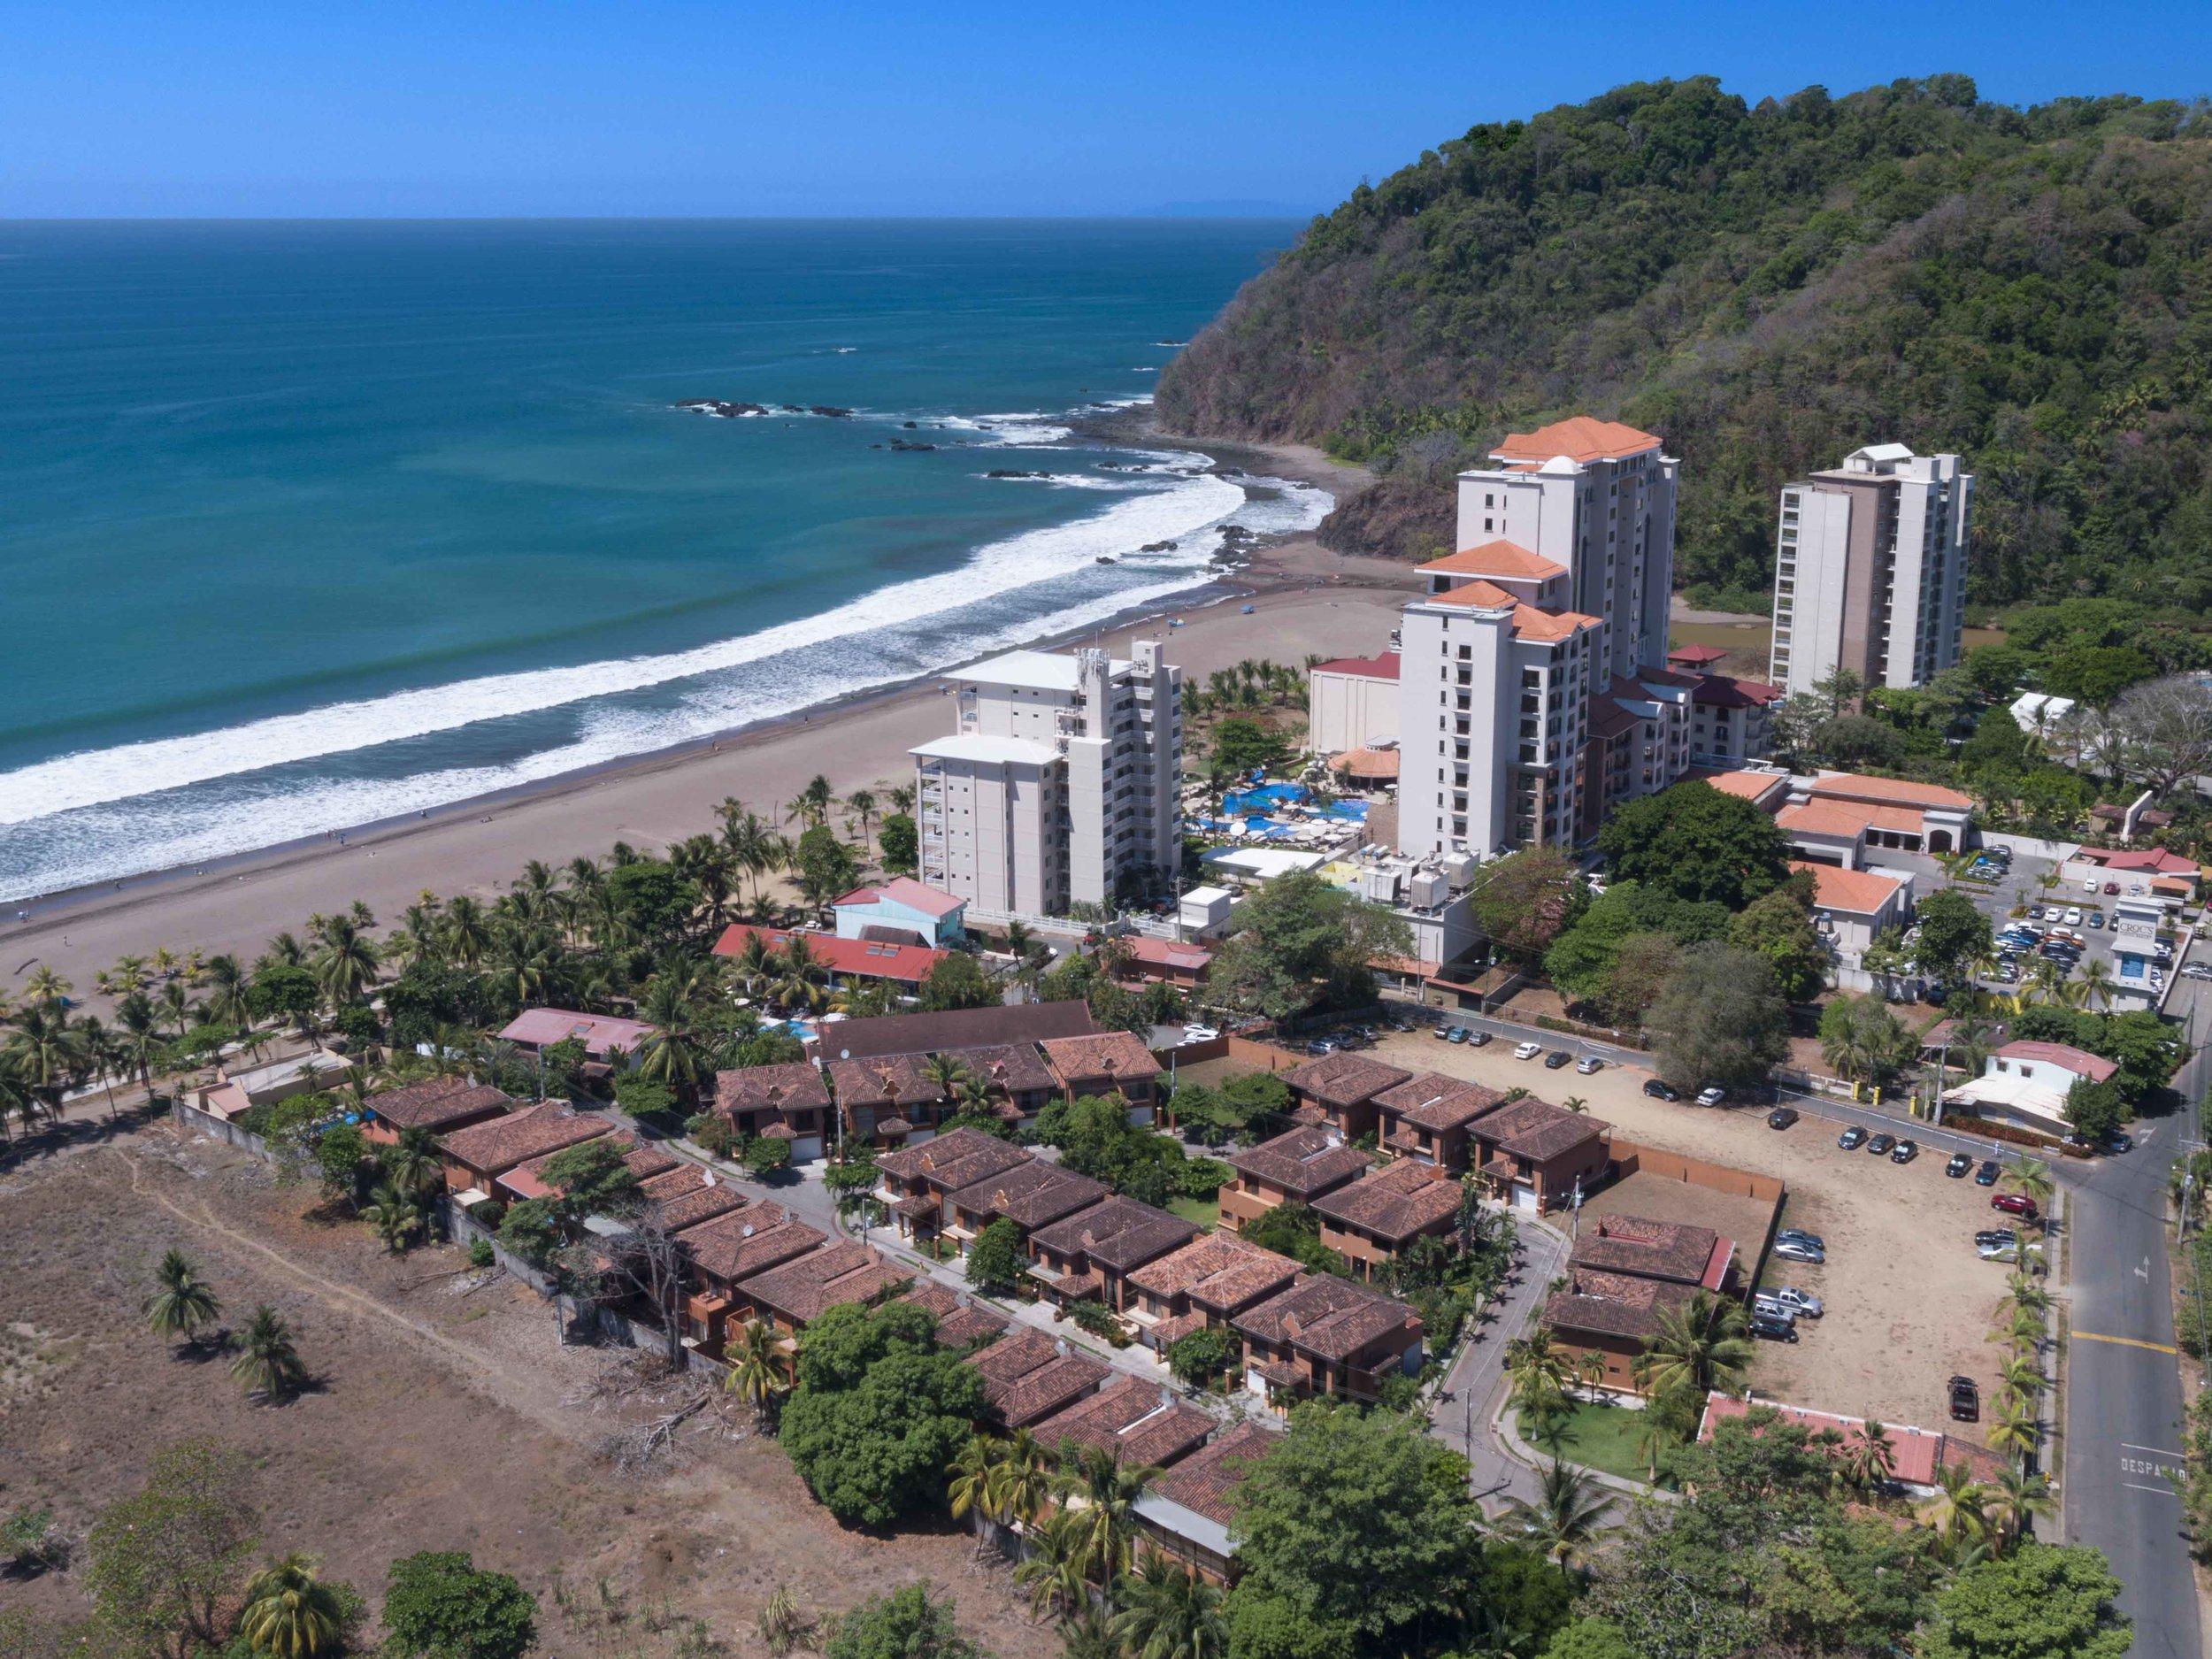 Jaco Costa Rica Villa Commercial Real Estate Drone